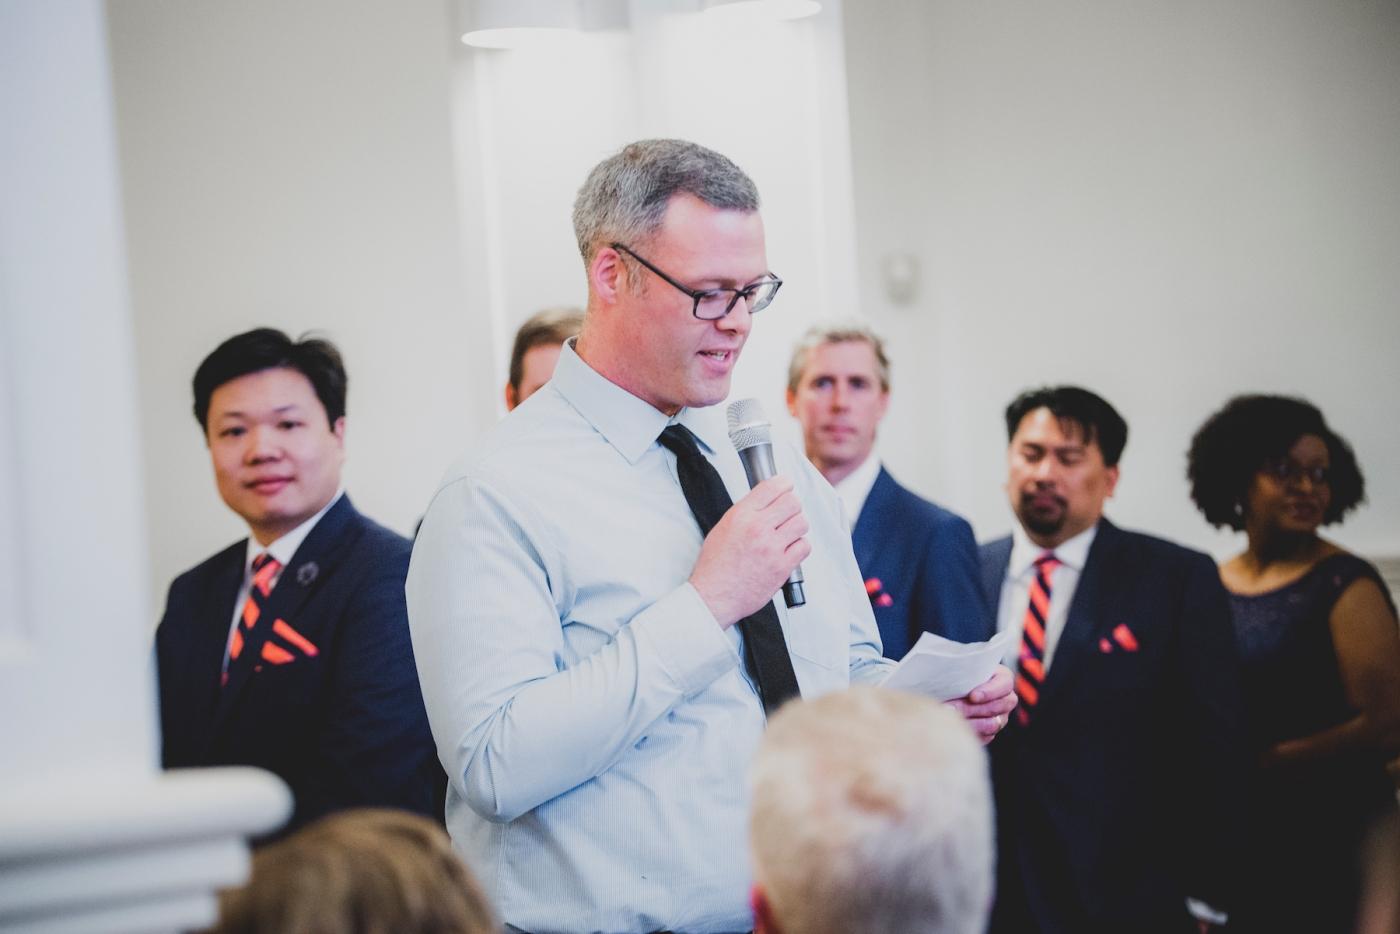 DSC_2590Everett_Wedding_Ballroom_Jane_Speleers_photography_Rachel_and_Edmund_Ceremony_2017